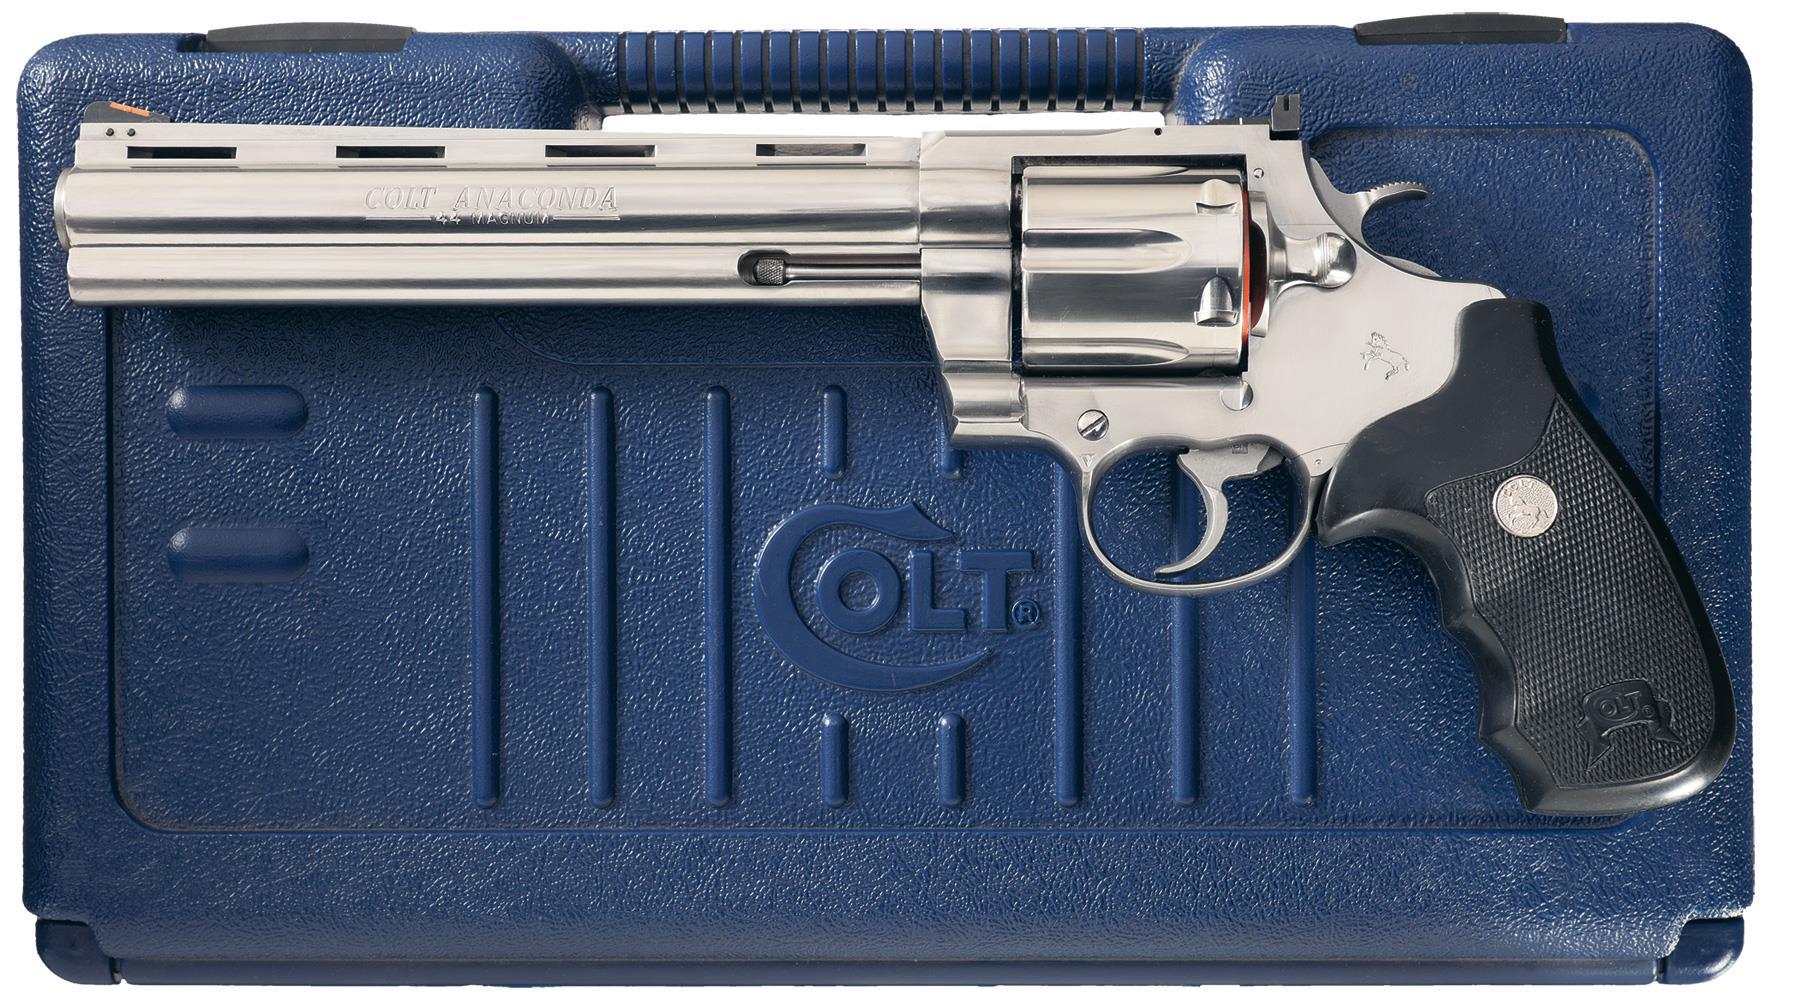 Colt Anaconda Double Action Revolver with Case